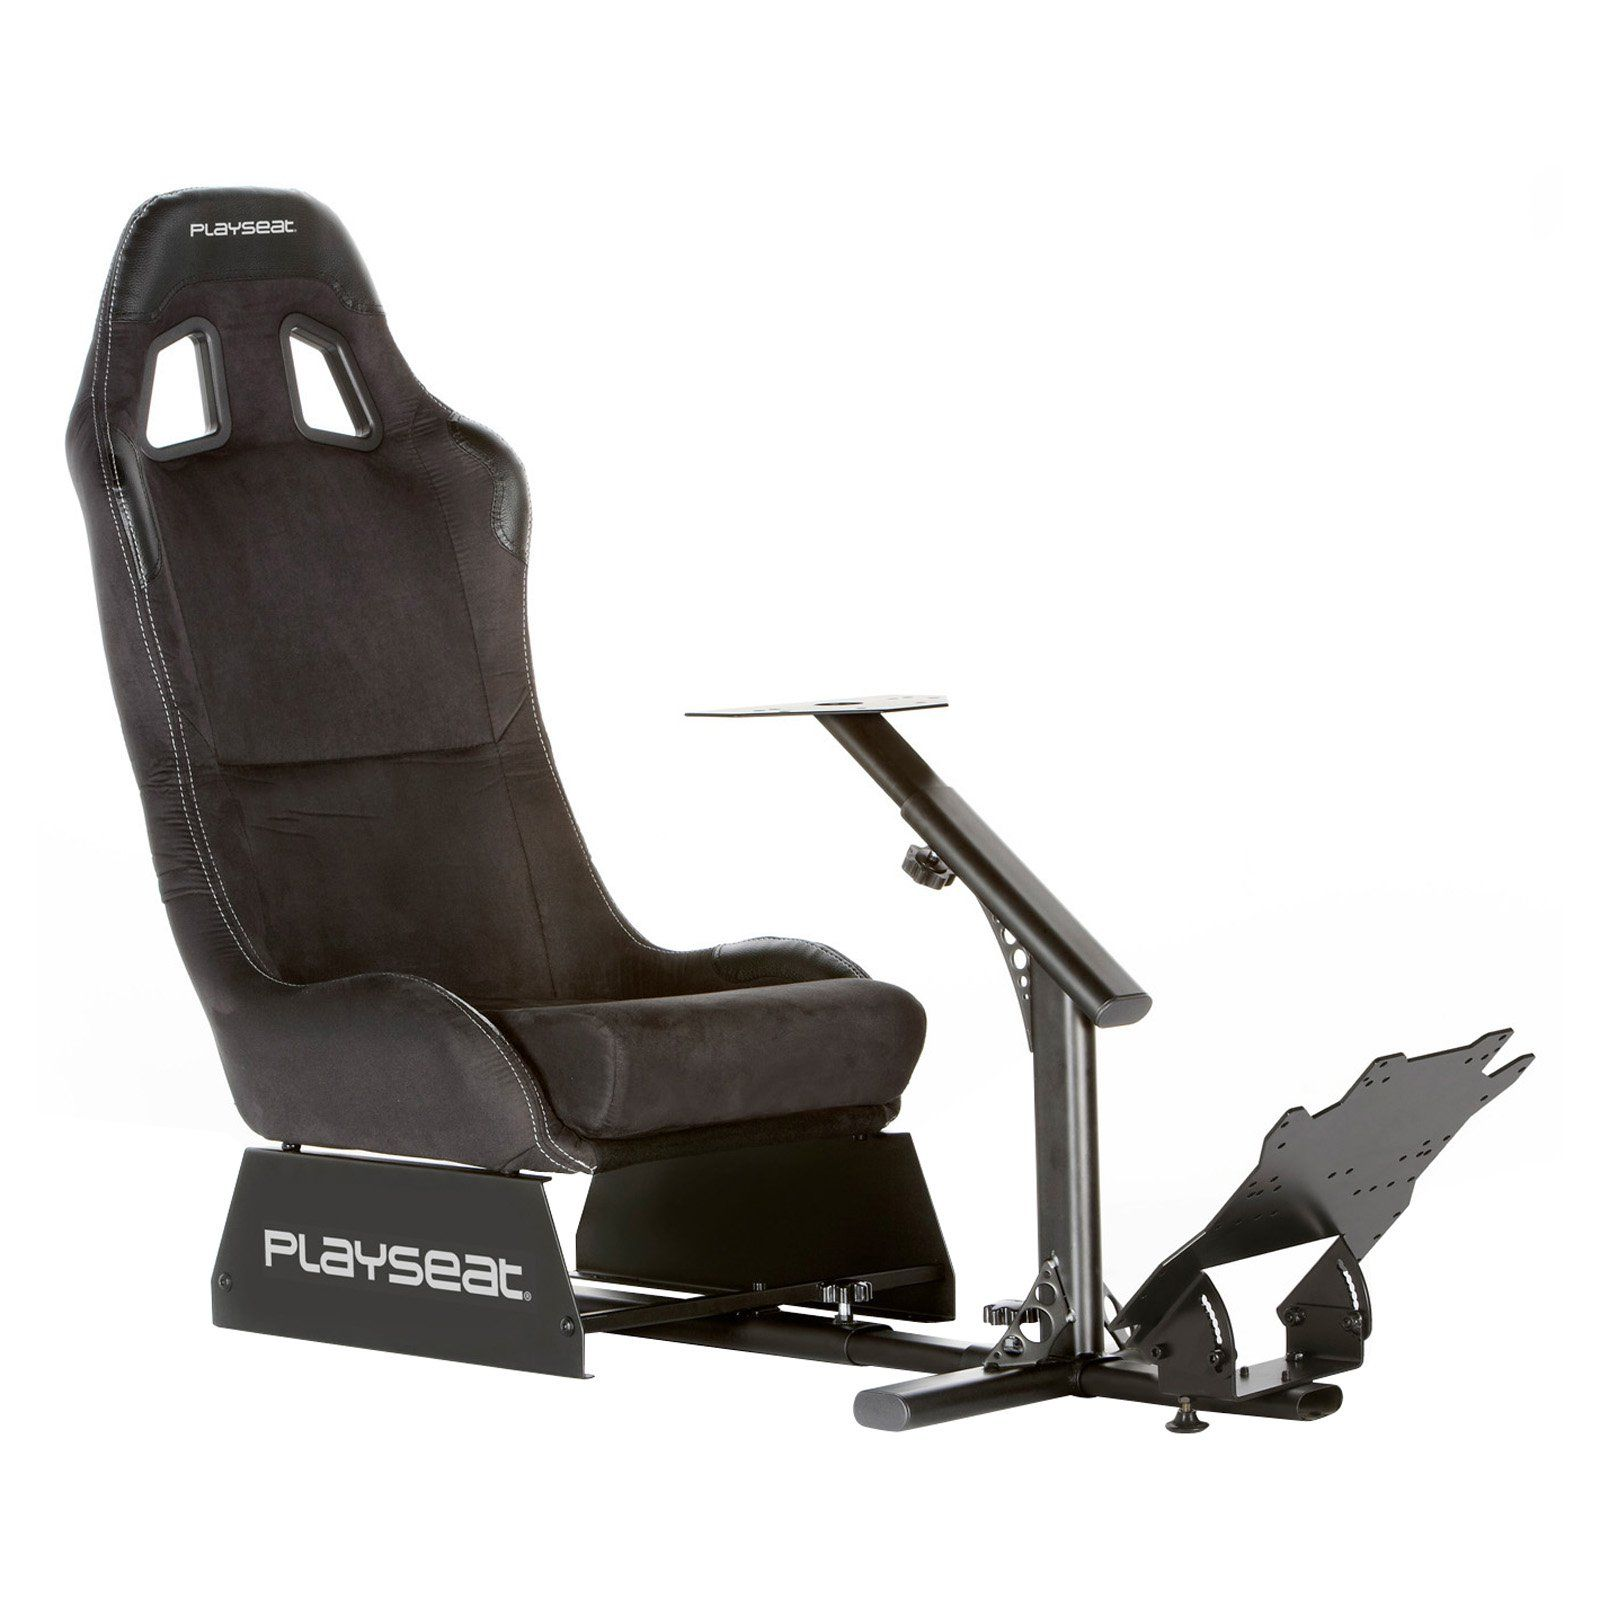 Playseat Evolution Gaming Chair Black Alcantara with Black Frame